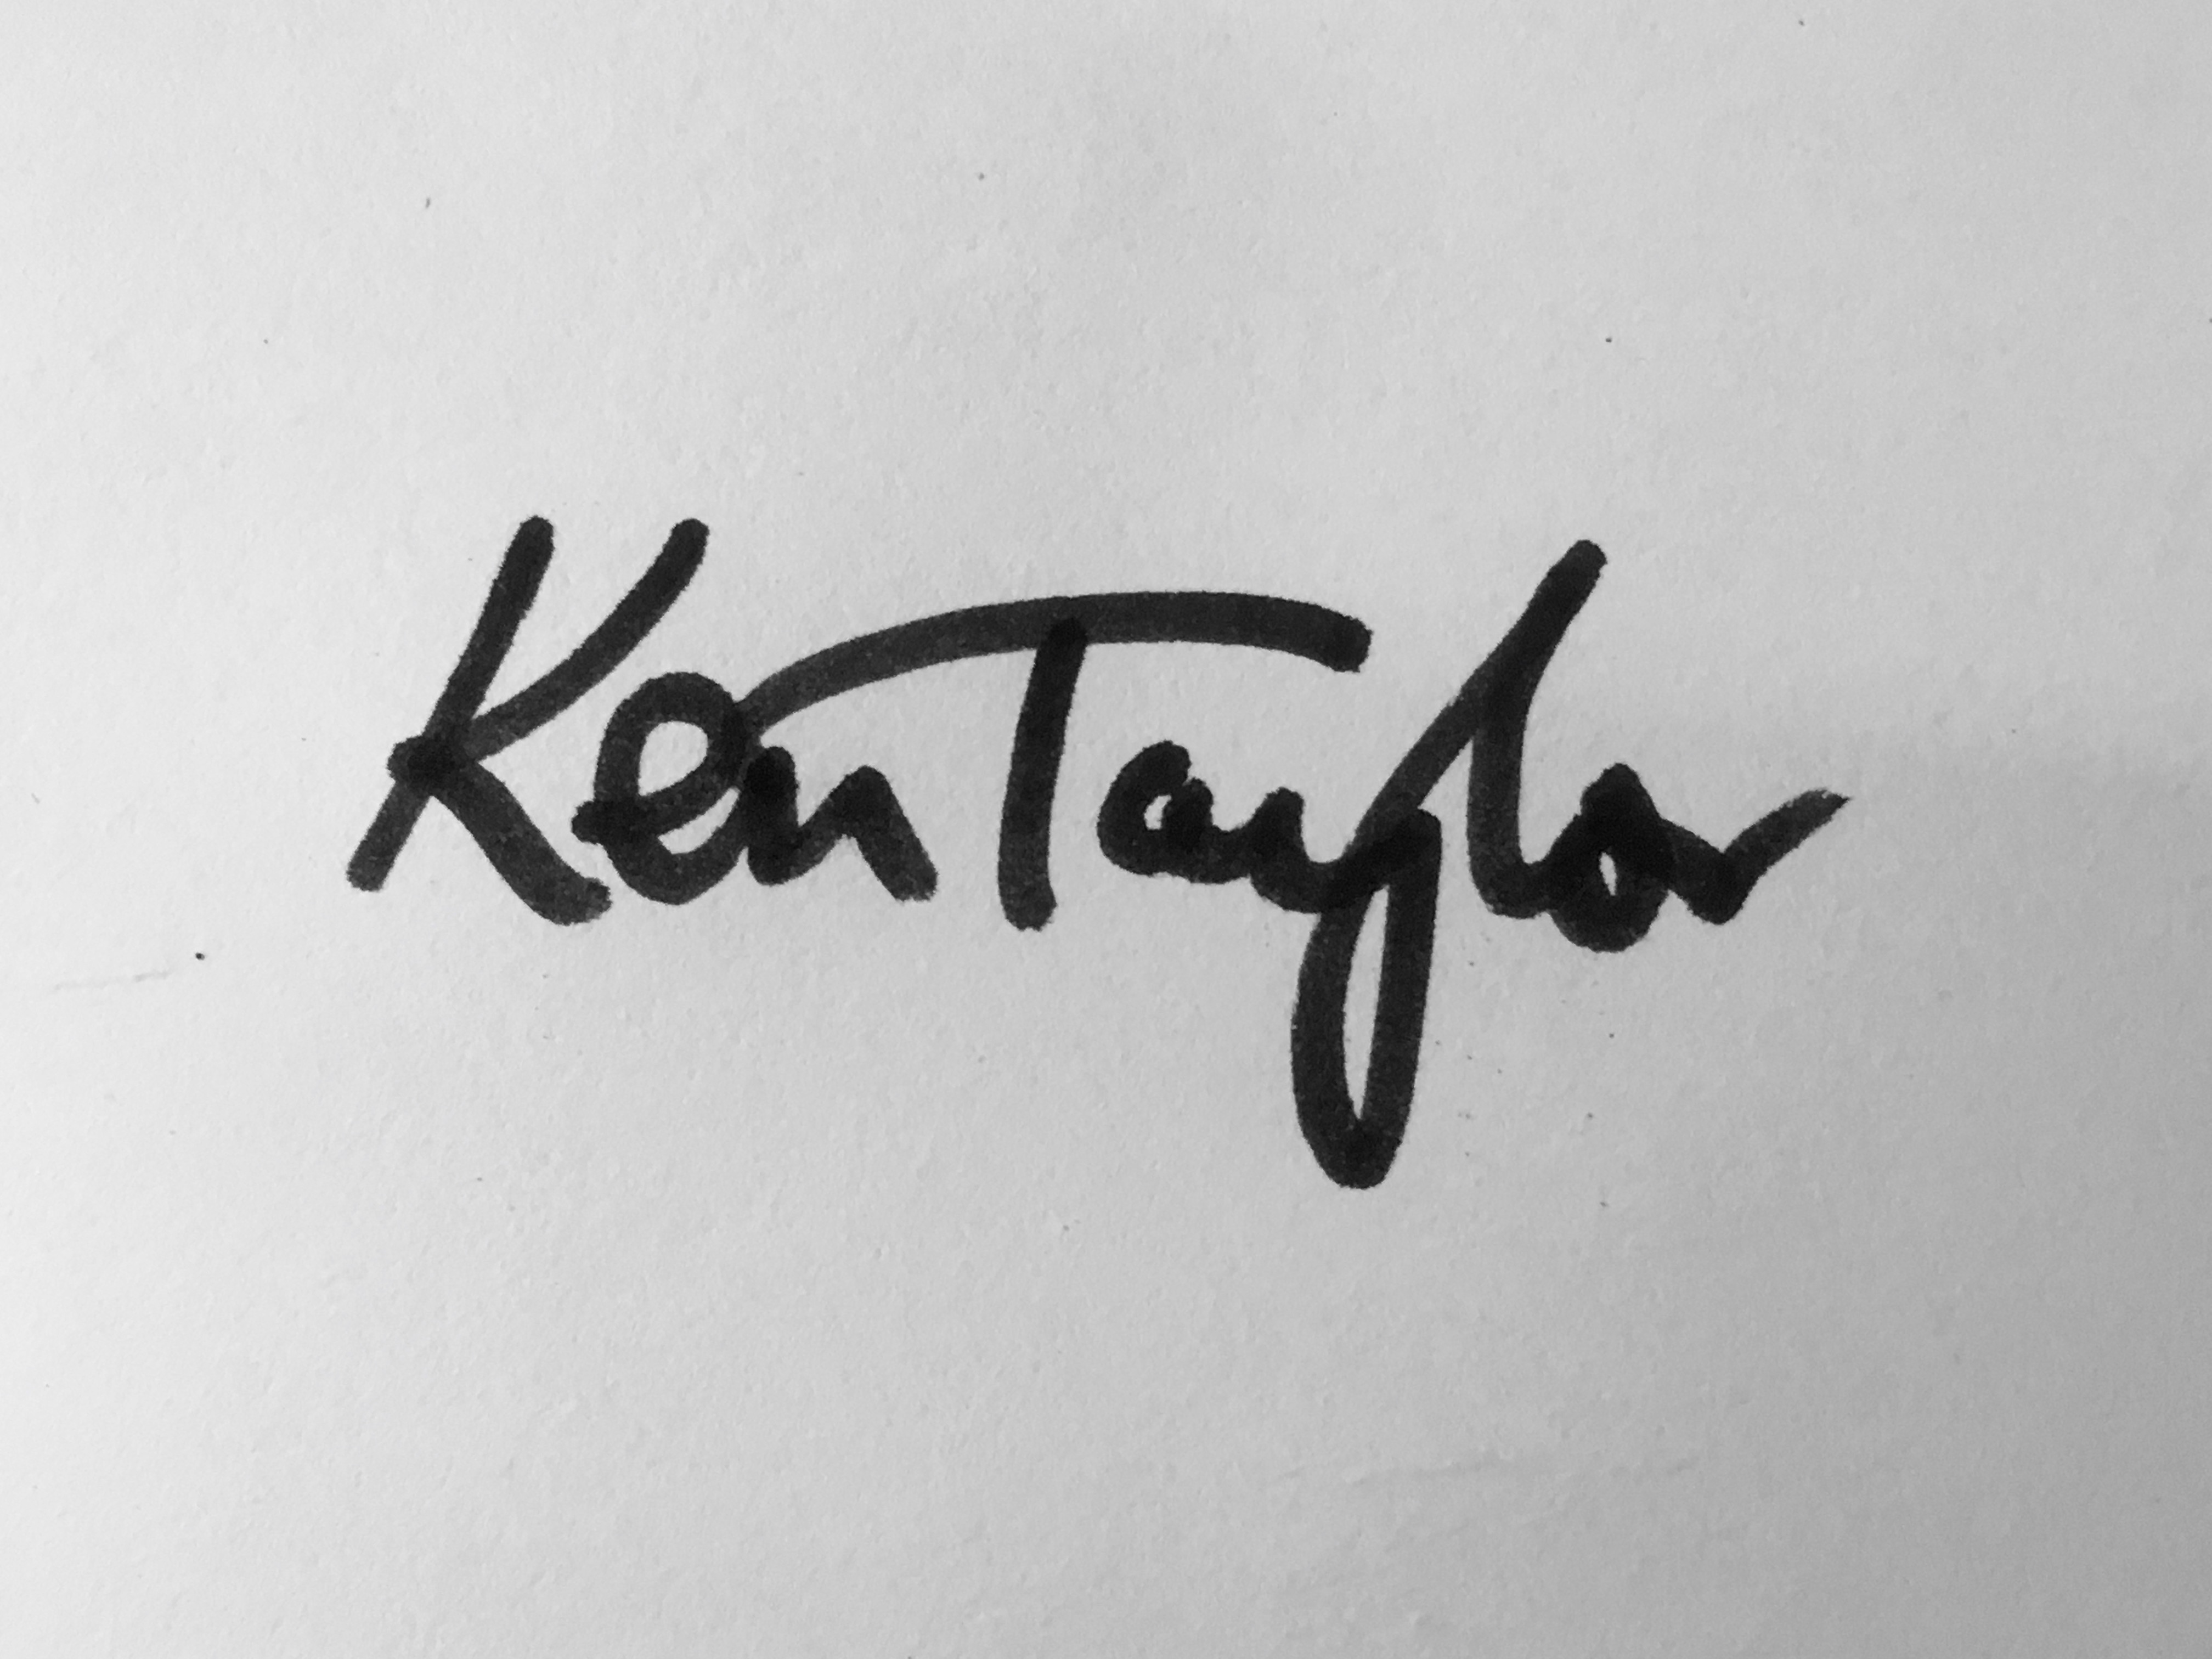 Ken Taylor's Signature